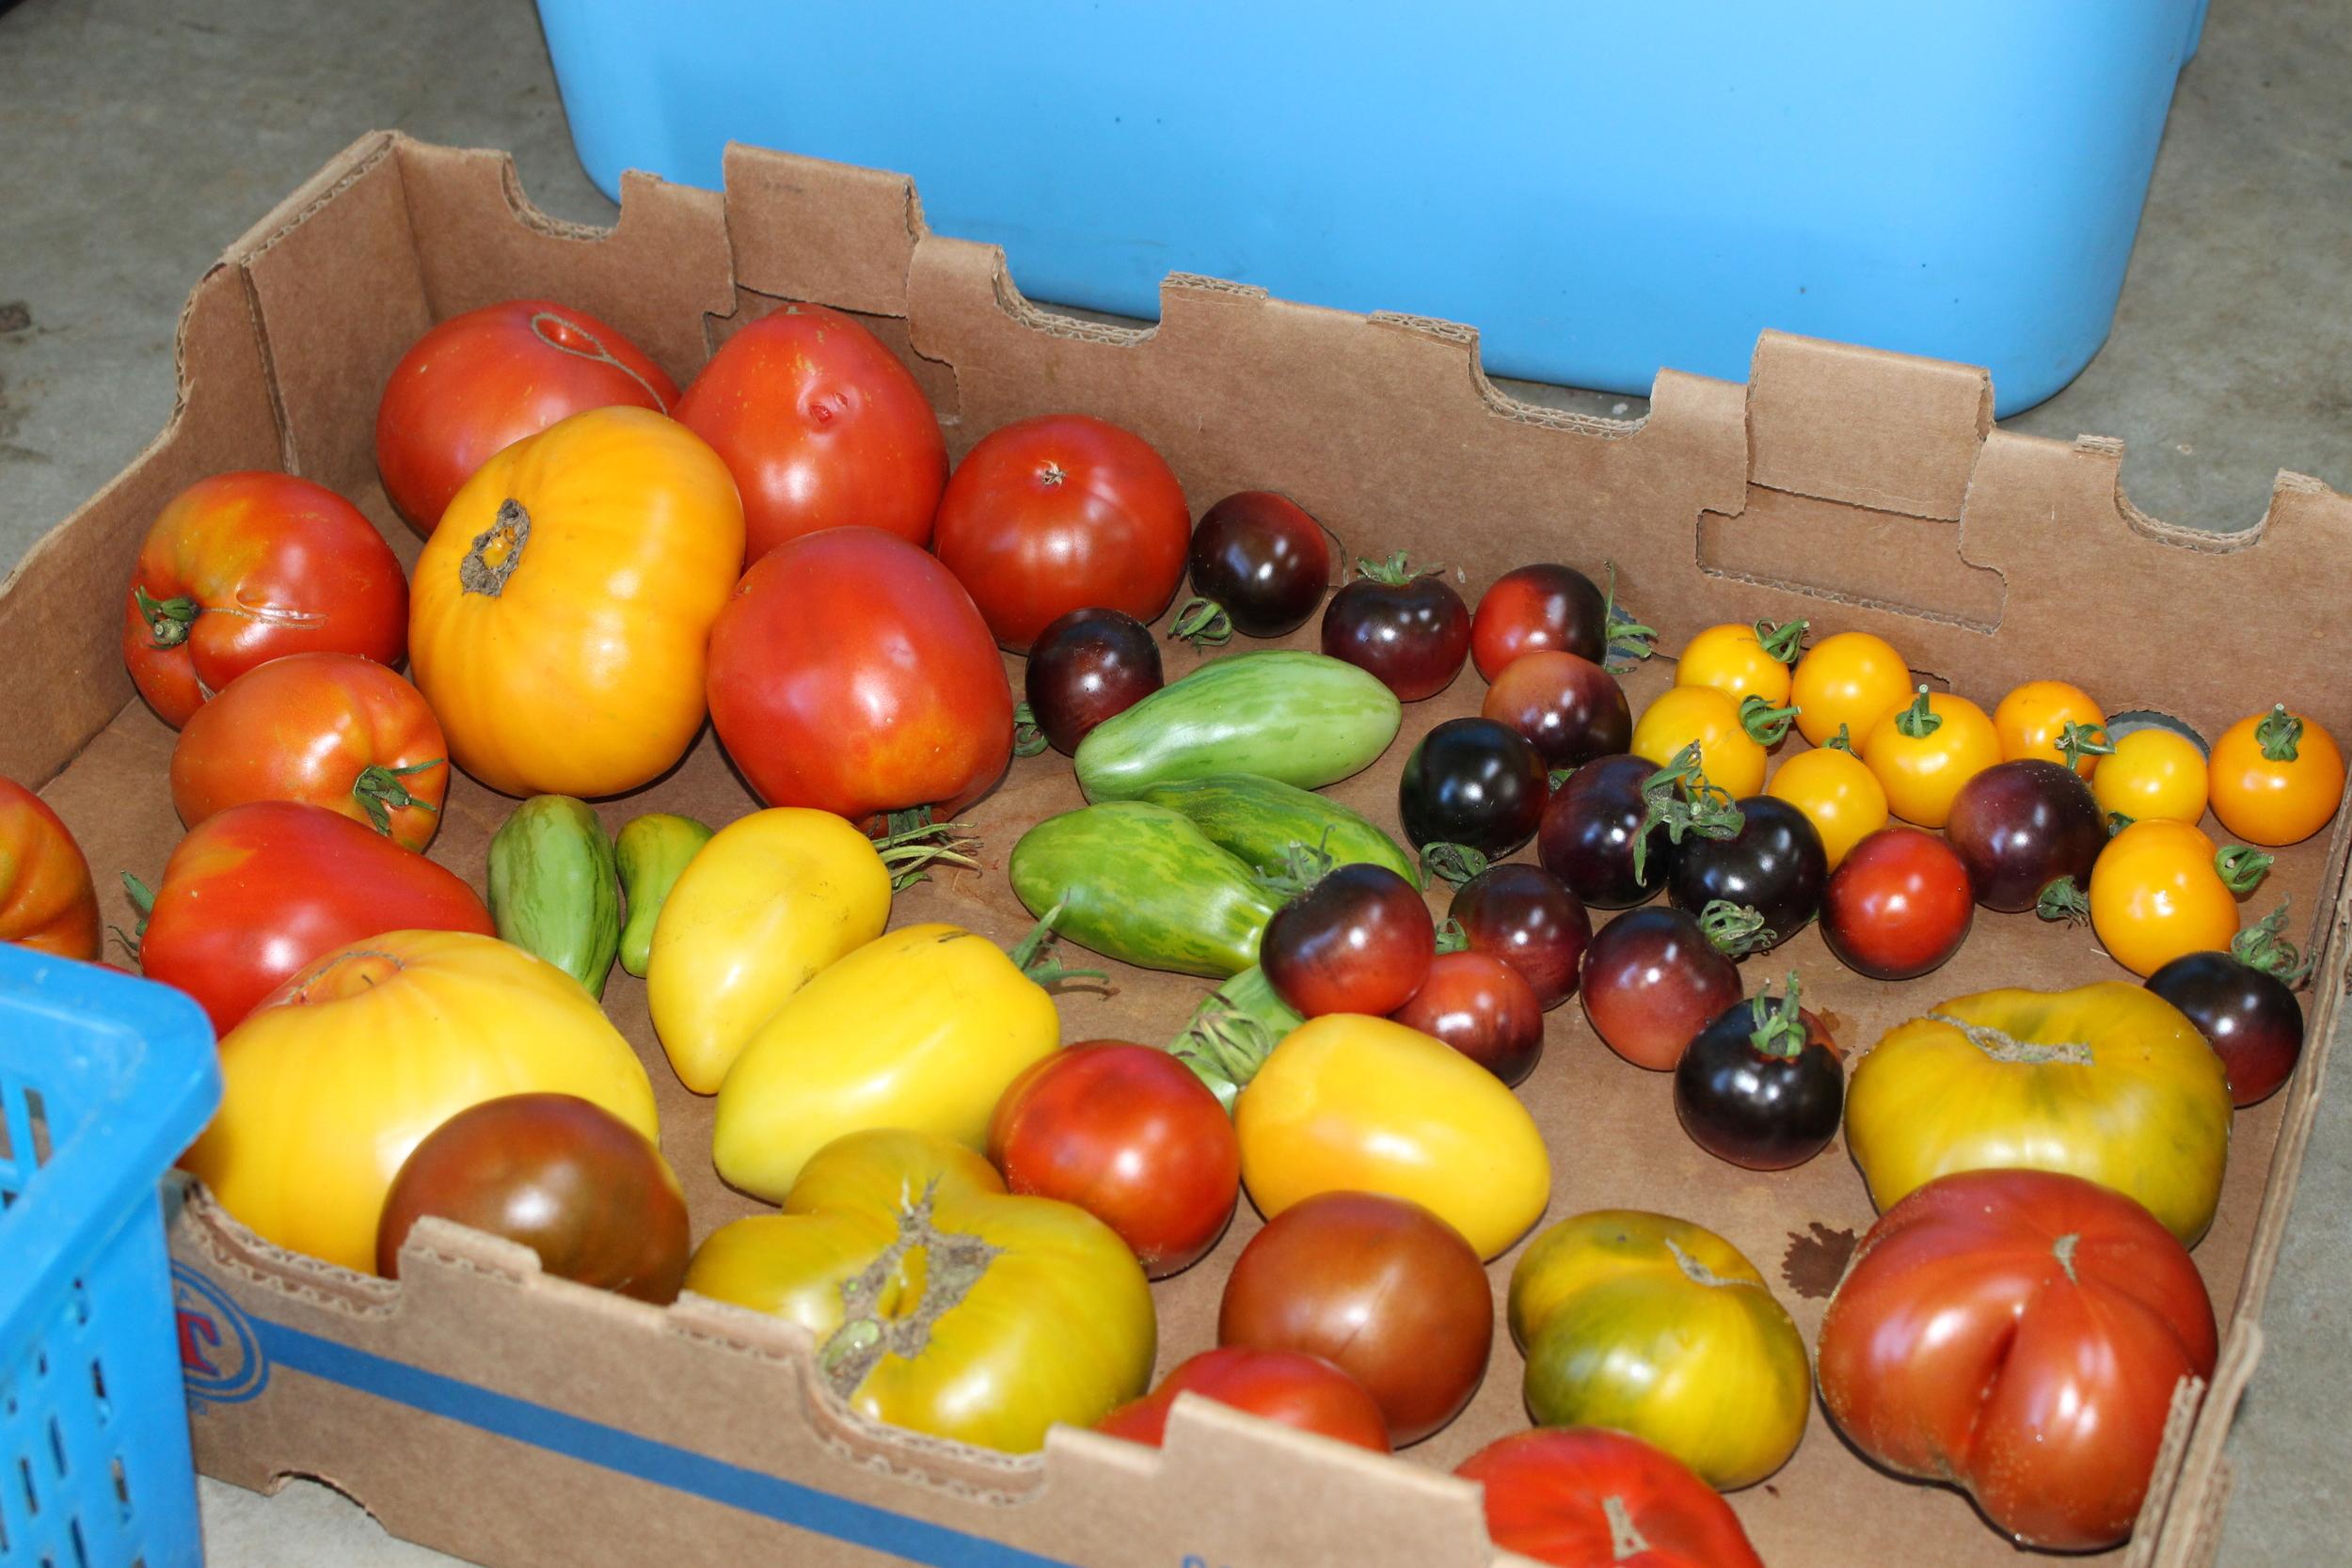 Heirloom tomatoes harvested in August